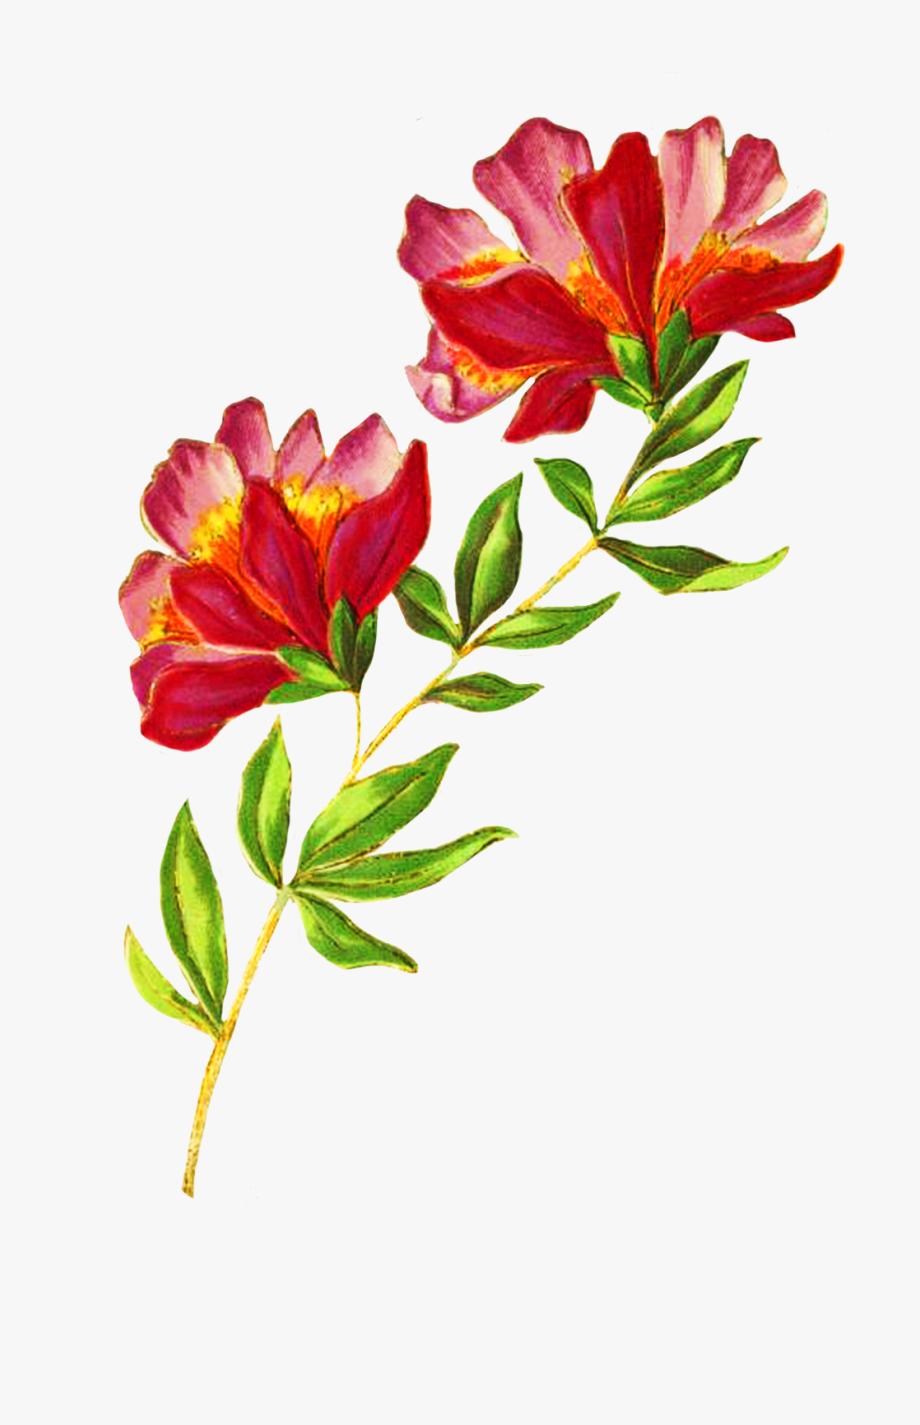 Digital Scrapbooking Flowers, Beautiful Delicate Flower.